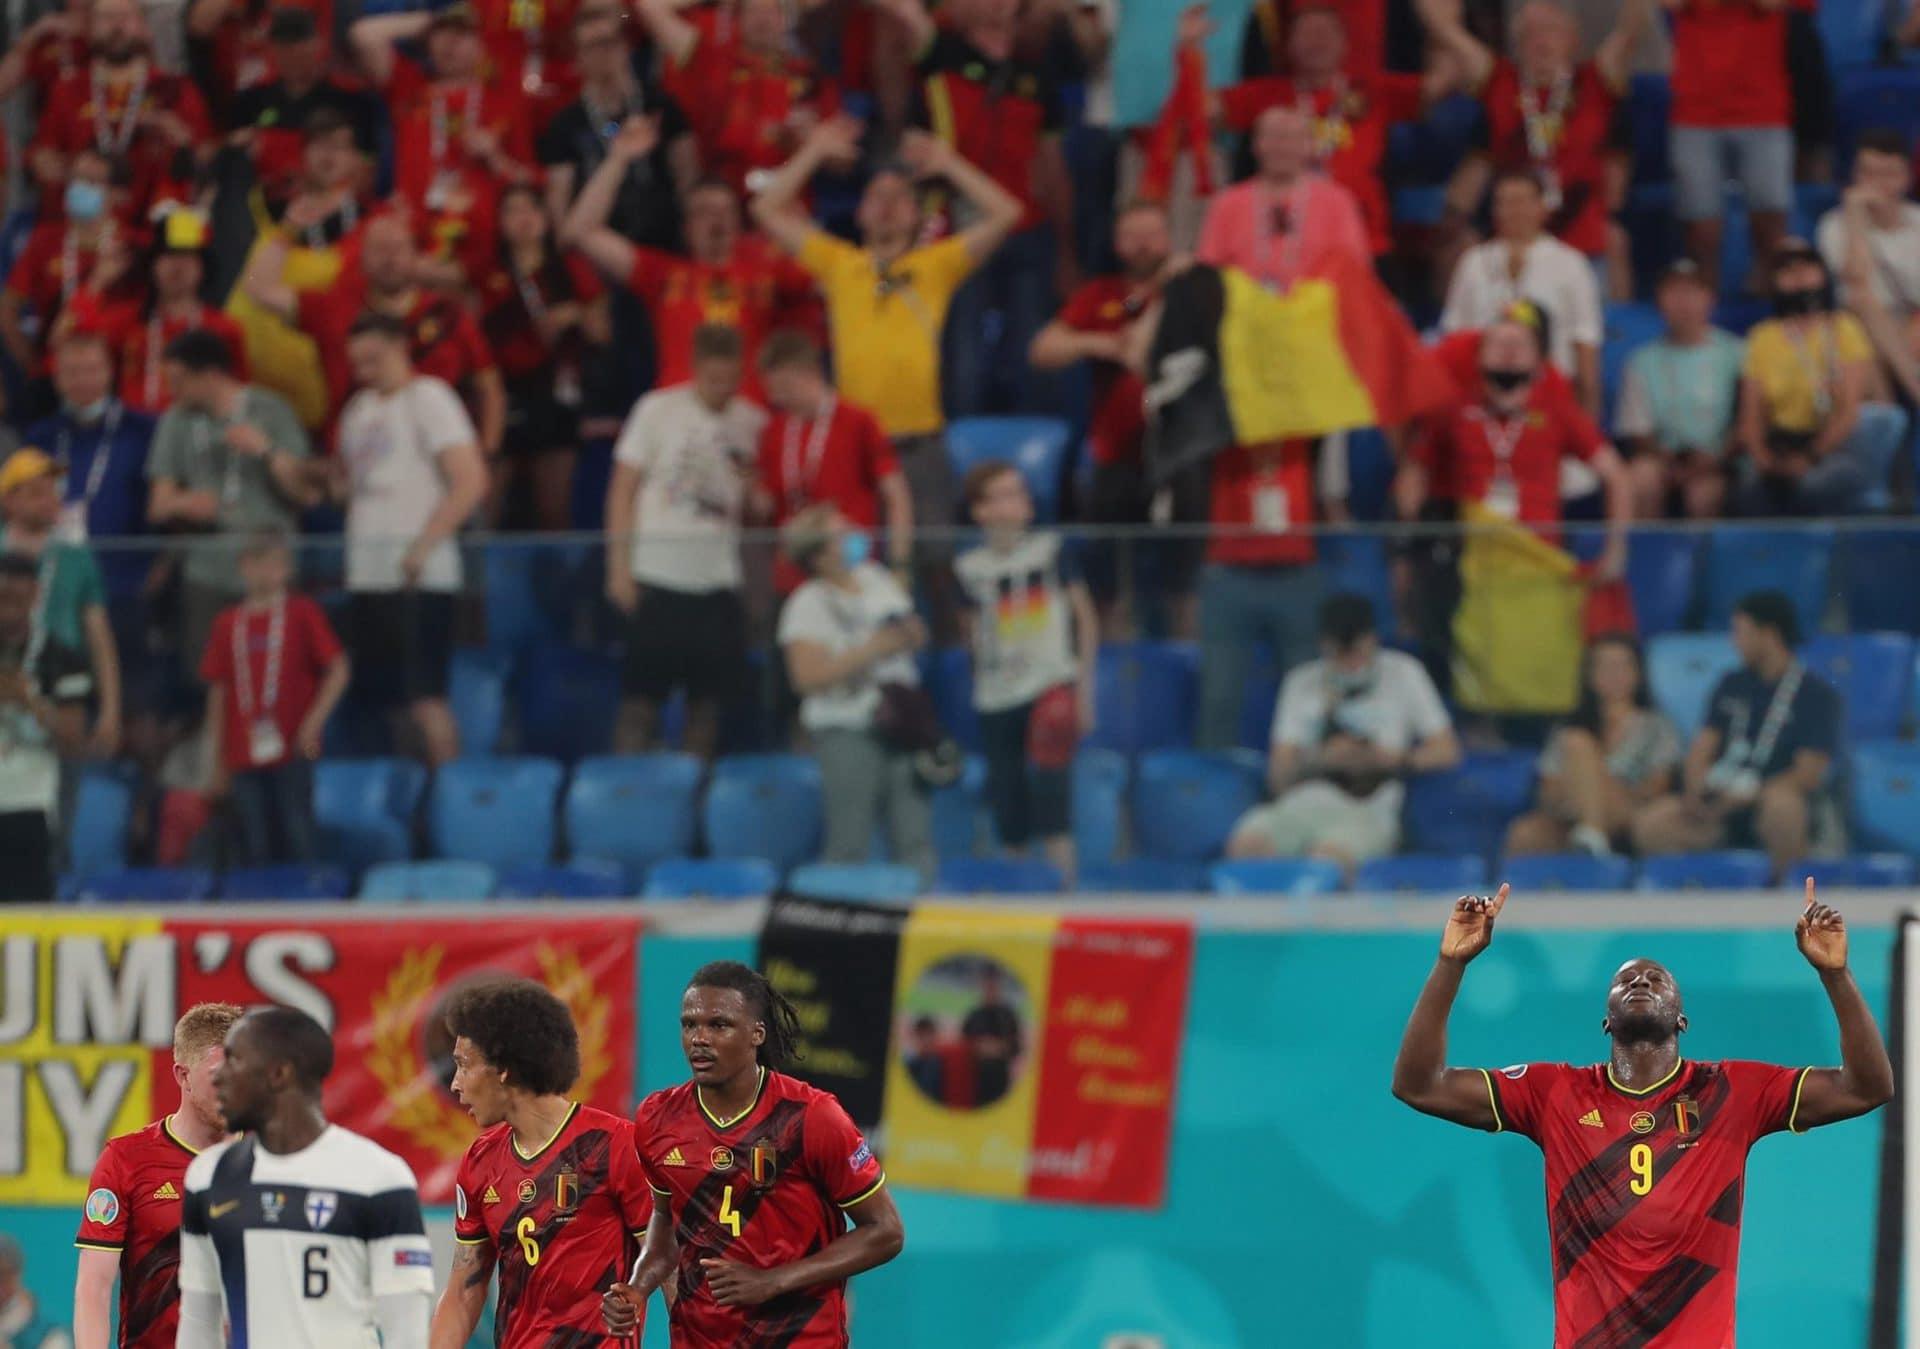 Belgien holt dritten EM-Vorrundensieg – Finnland muss bangen Fußball-EM